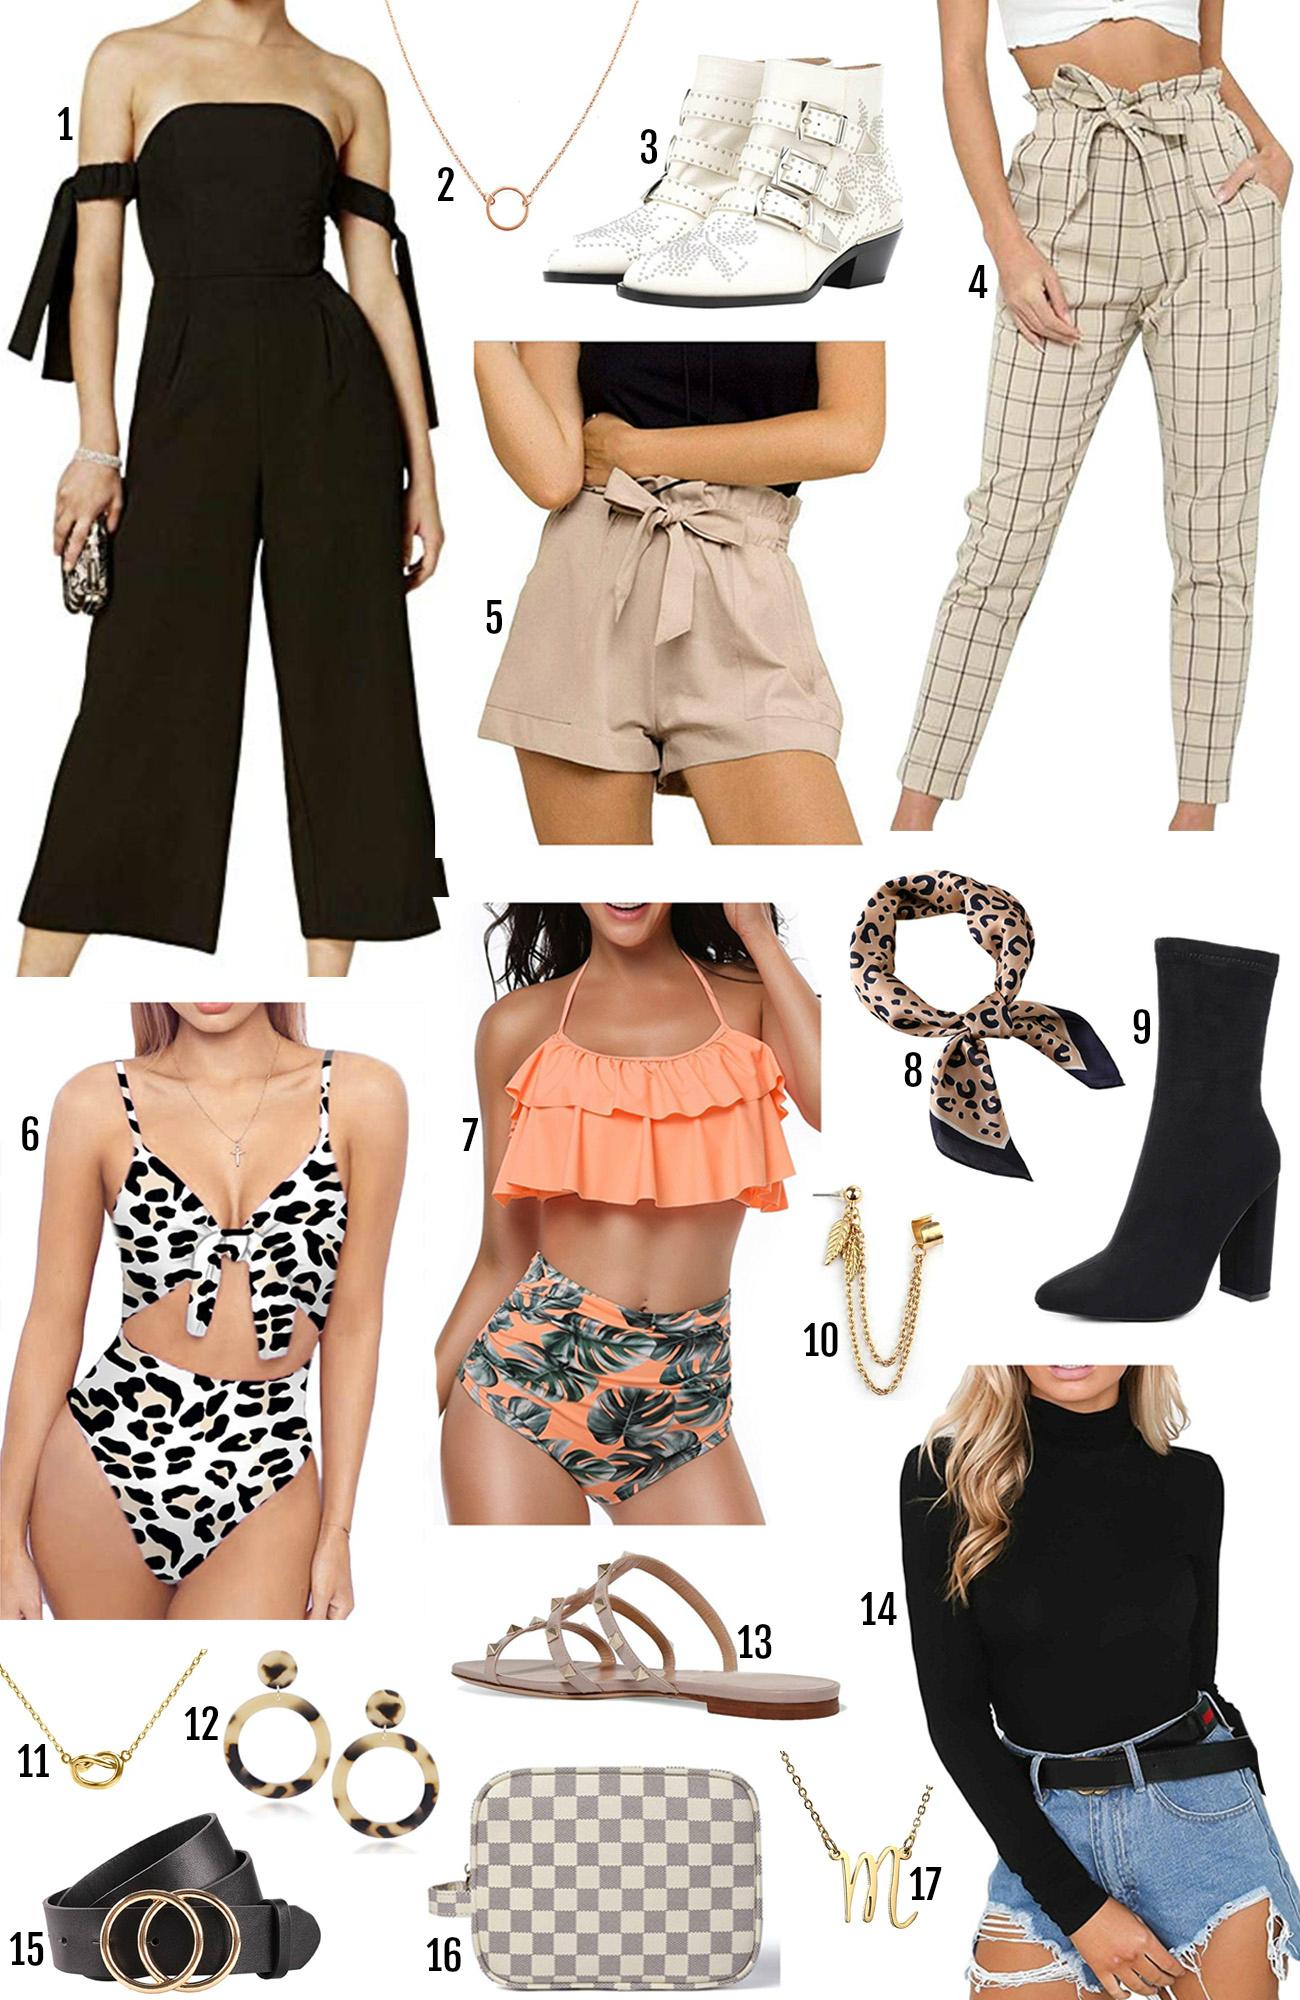 Mash Elle beauty style blogger | Amazon fashion | spring fashion 2019 | spring style | style trends 2019 | tropical print spring | woven bag